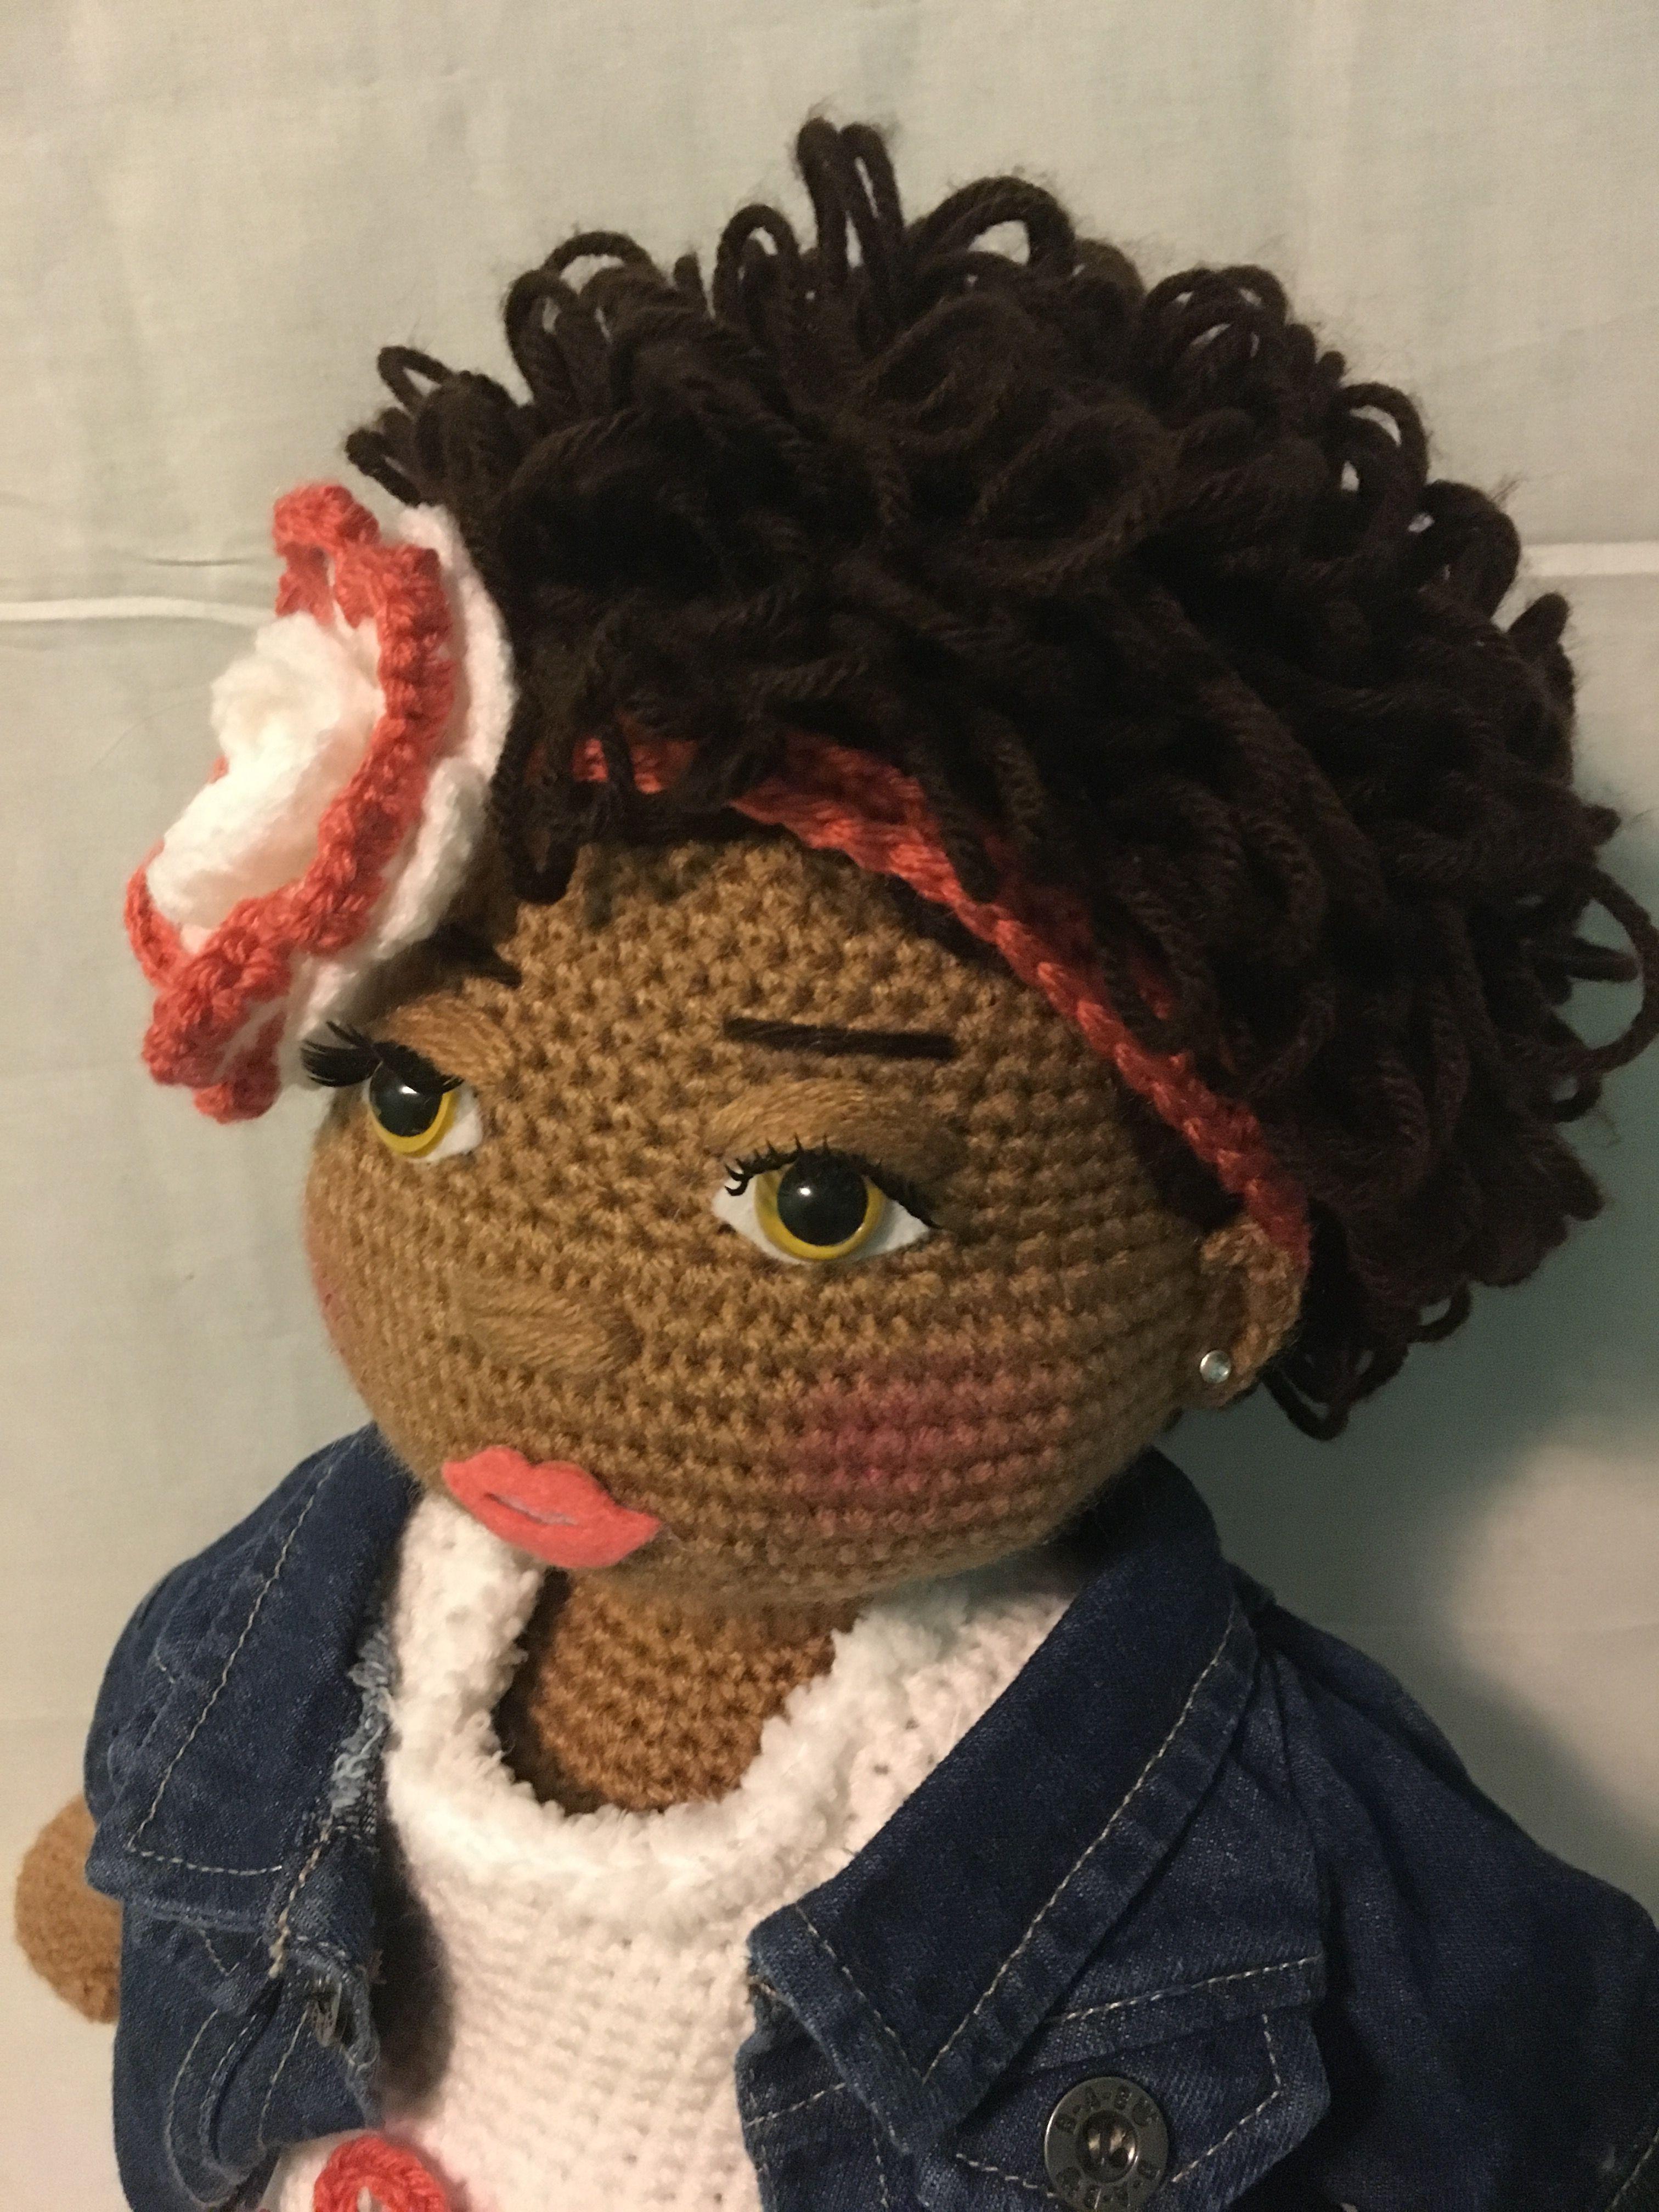 Boneca amigurumi/ boneca crochê no Elo7 | Novelo de ideias Ateliê ... | 4032x3024